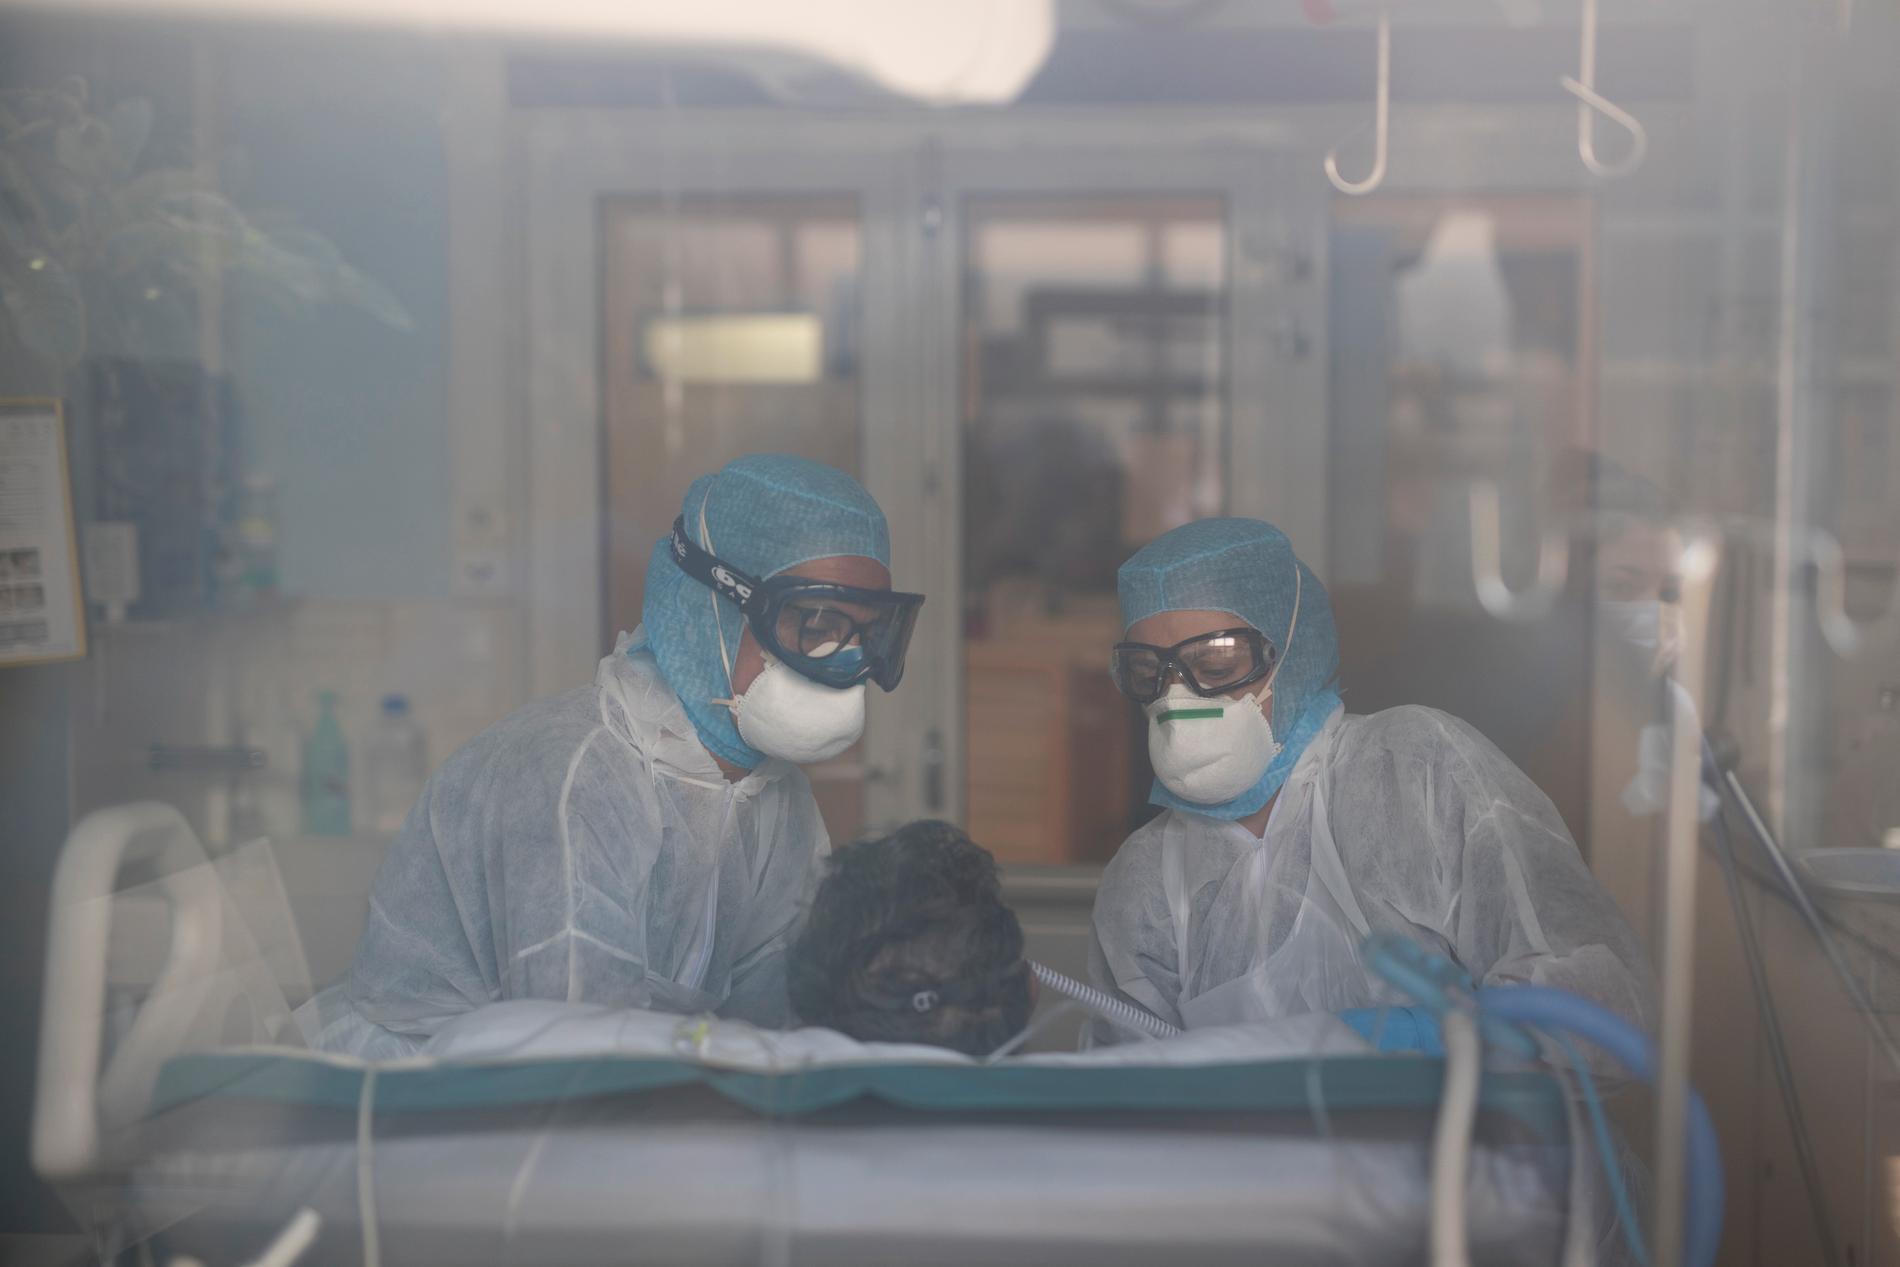 Sjukvårdspersonal på ett sjukhus i Frankrike.